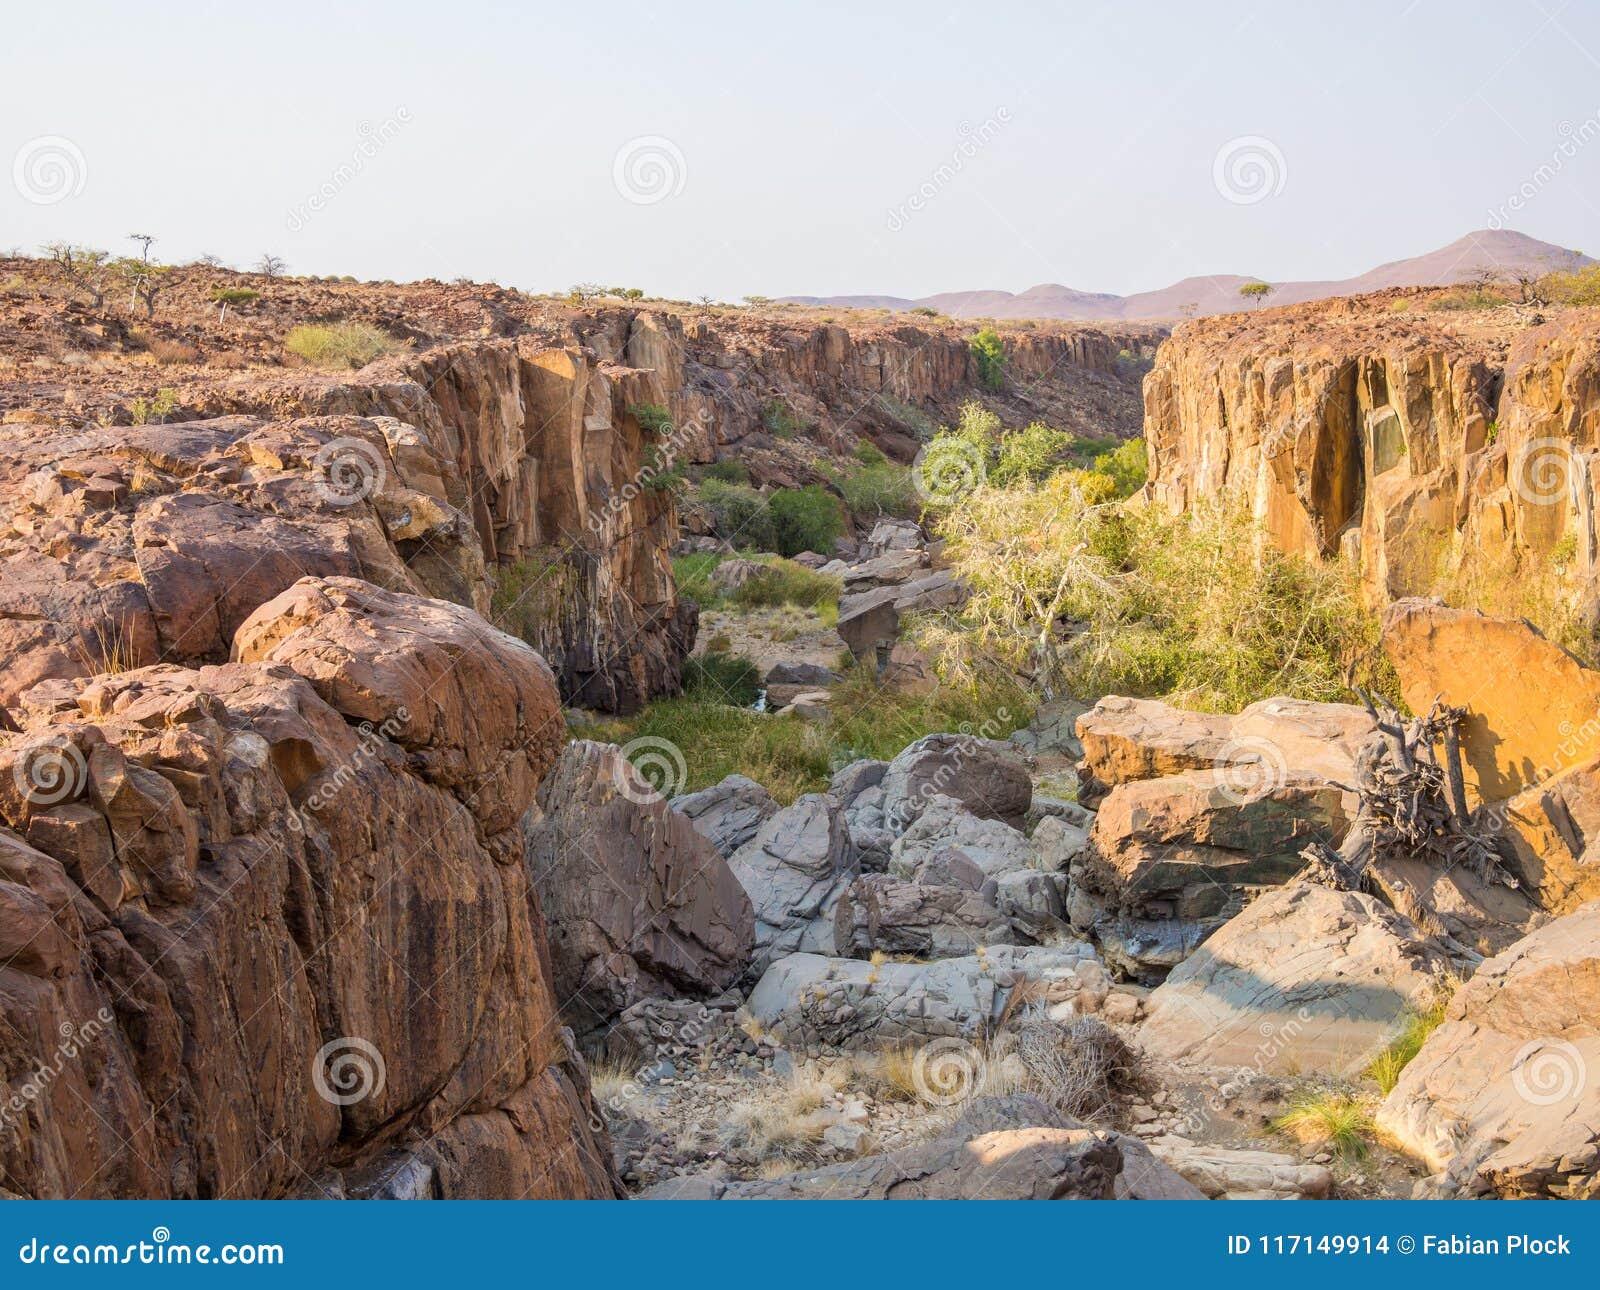 Rotsachtige canion met groene struiken en bomen in Palmwag-Concessie, Namibië, Zuid-Afrika